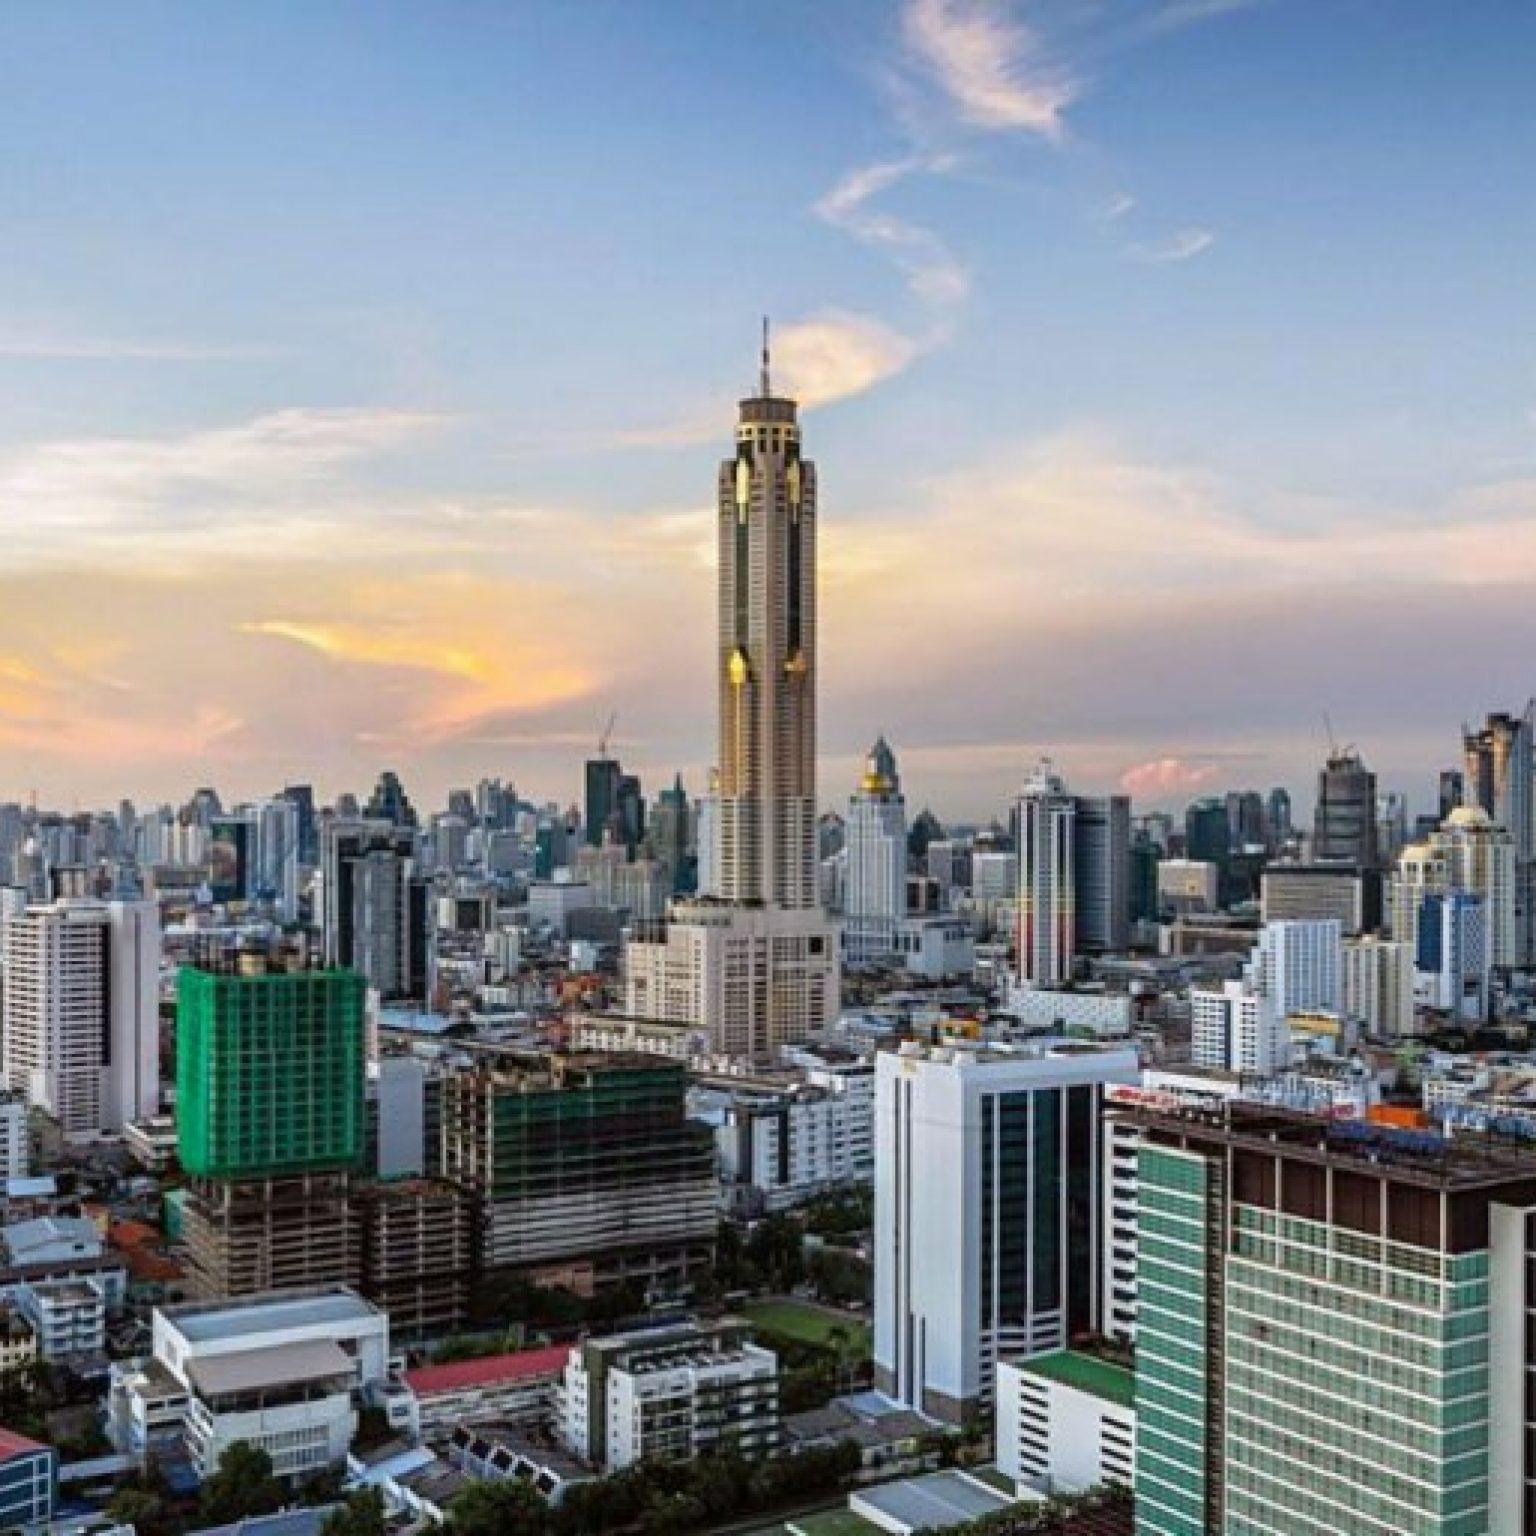 Attractions in Bangkok: Hotel-the skyscraper Baiyoke Sky